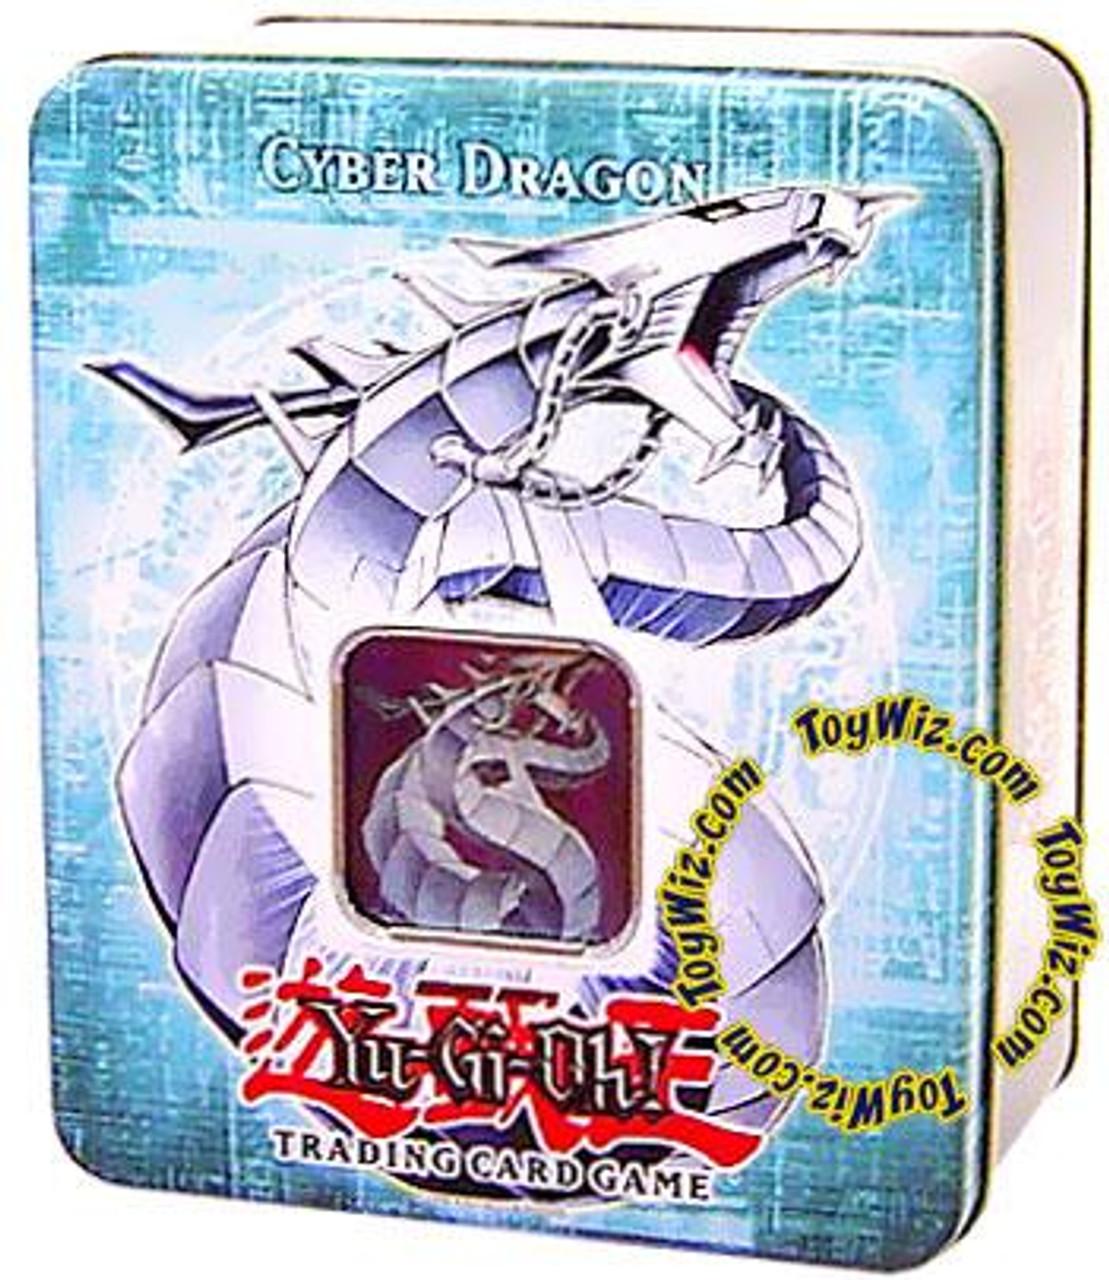 YuGiOh GX 2006 Collector Tin Cyber Dragon Collector Tin [Sealed]